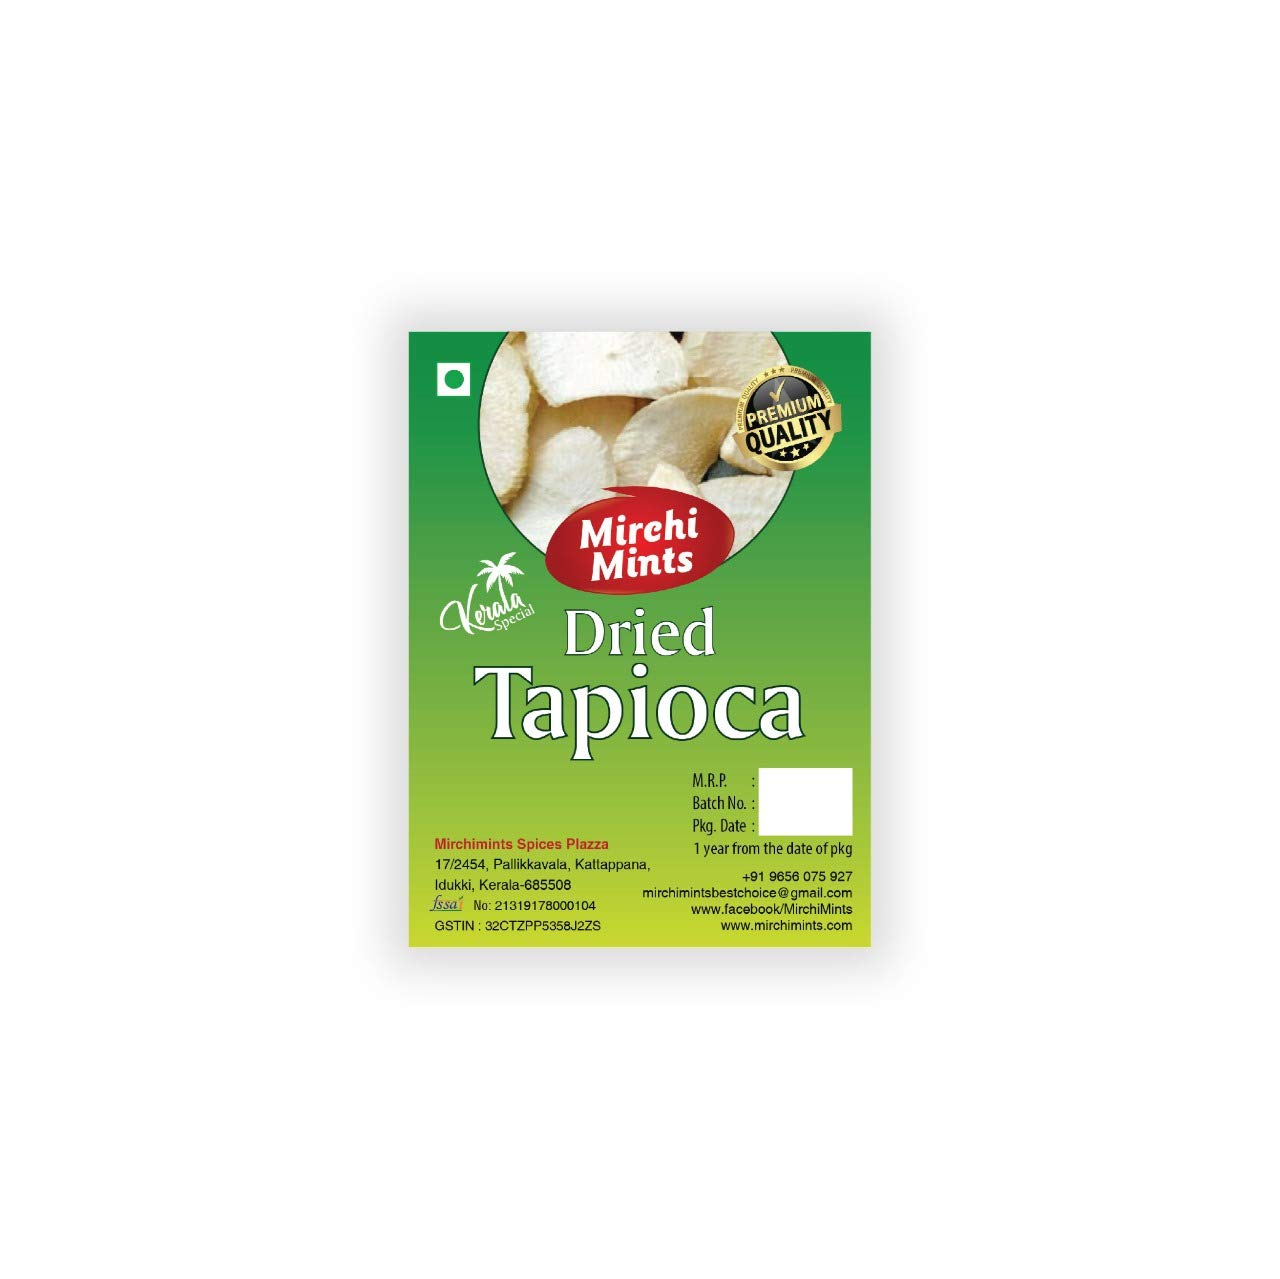 Mirchimints Dried Kerala Tapioca